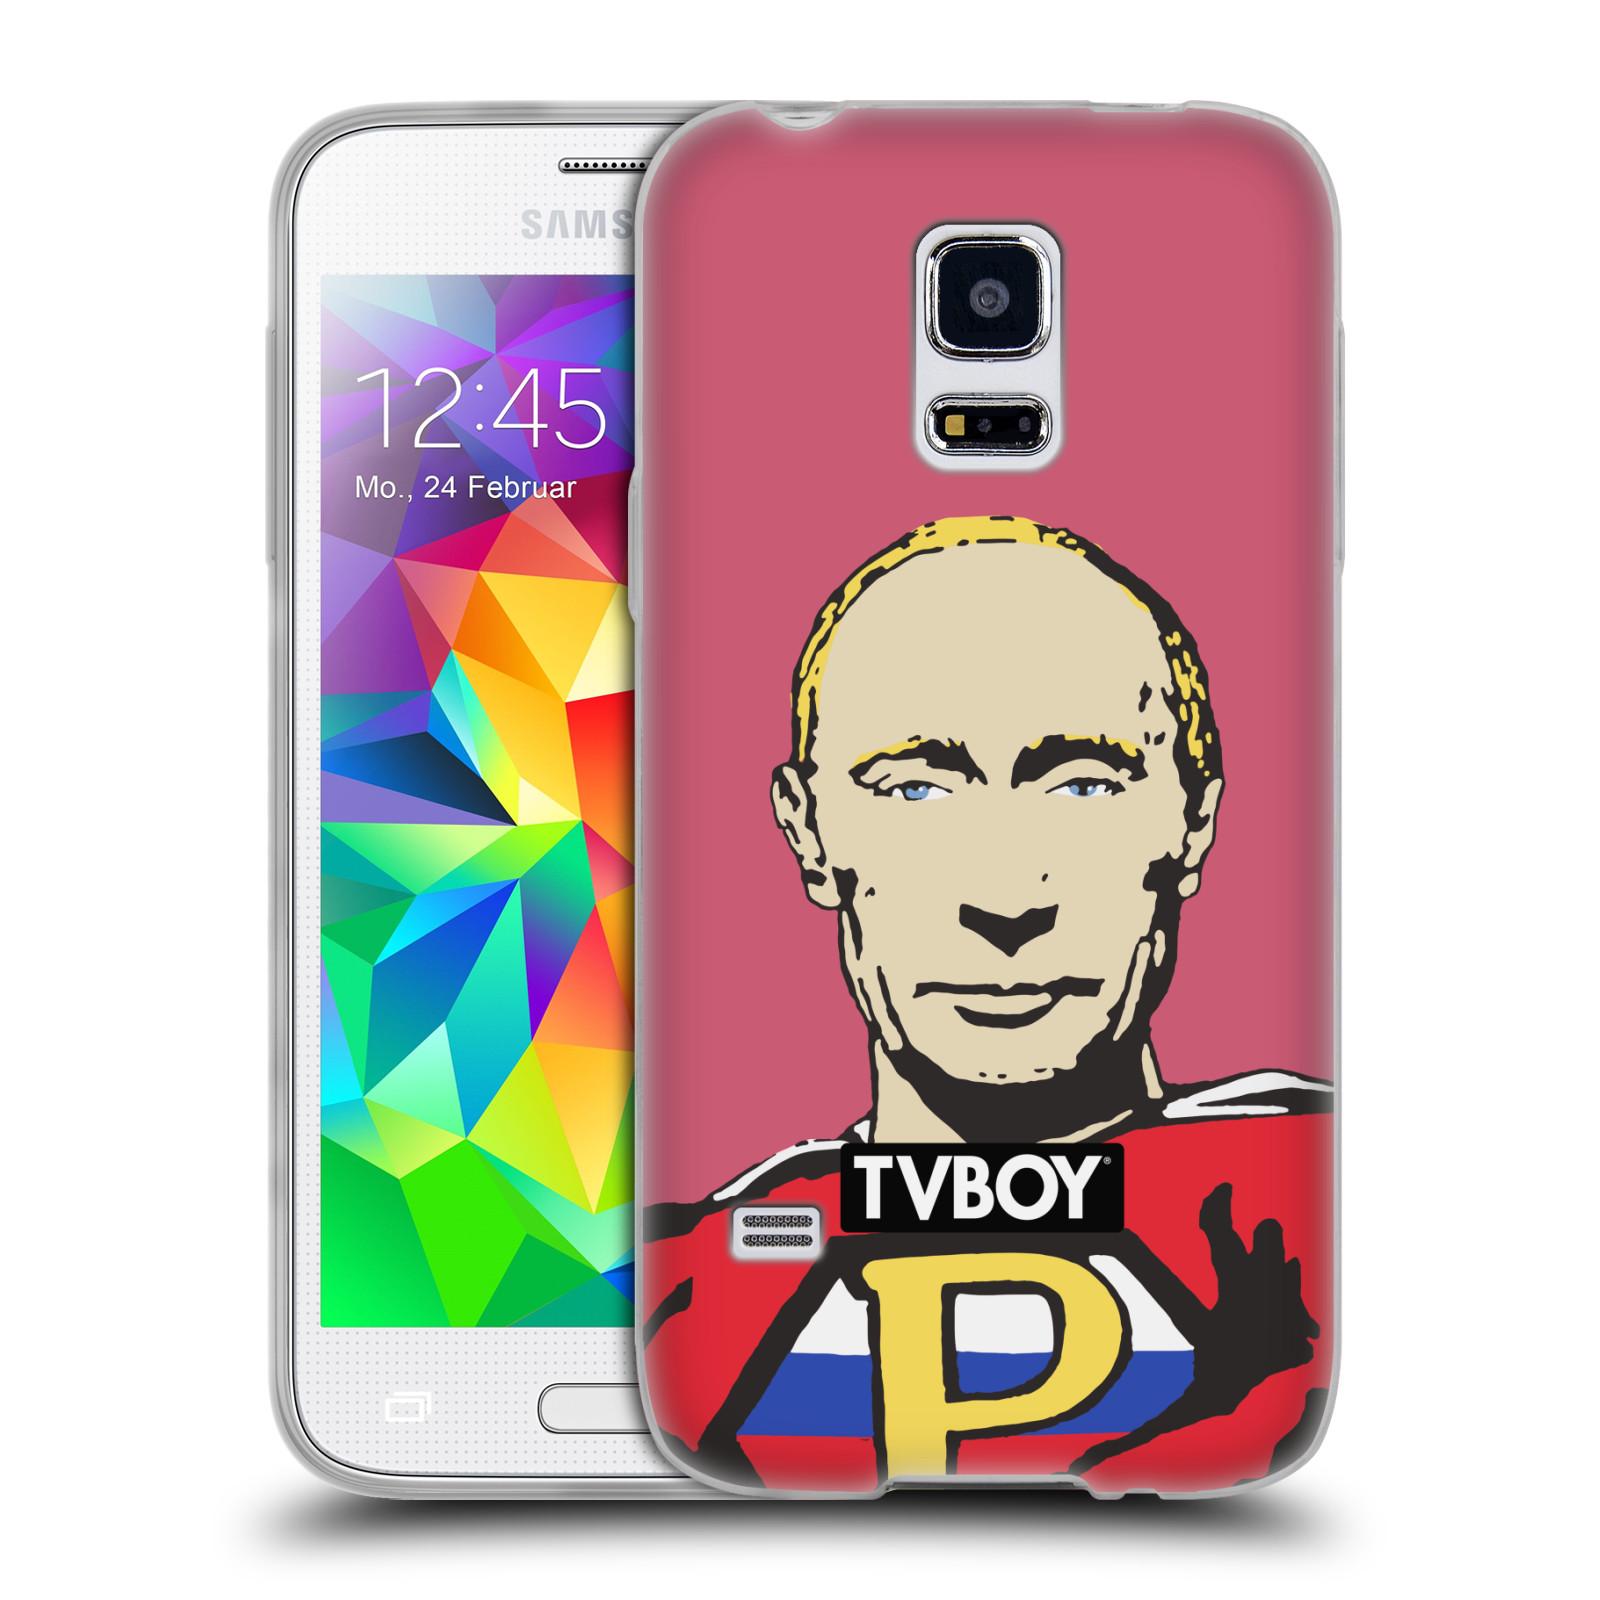 Silikonové pouzdro na mobil Samsung Galaxy S5 Mini HEAD CASE - TVBOY - Super Putin